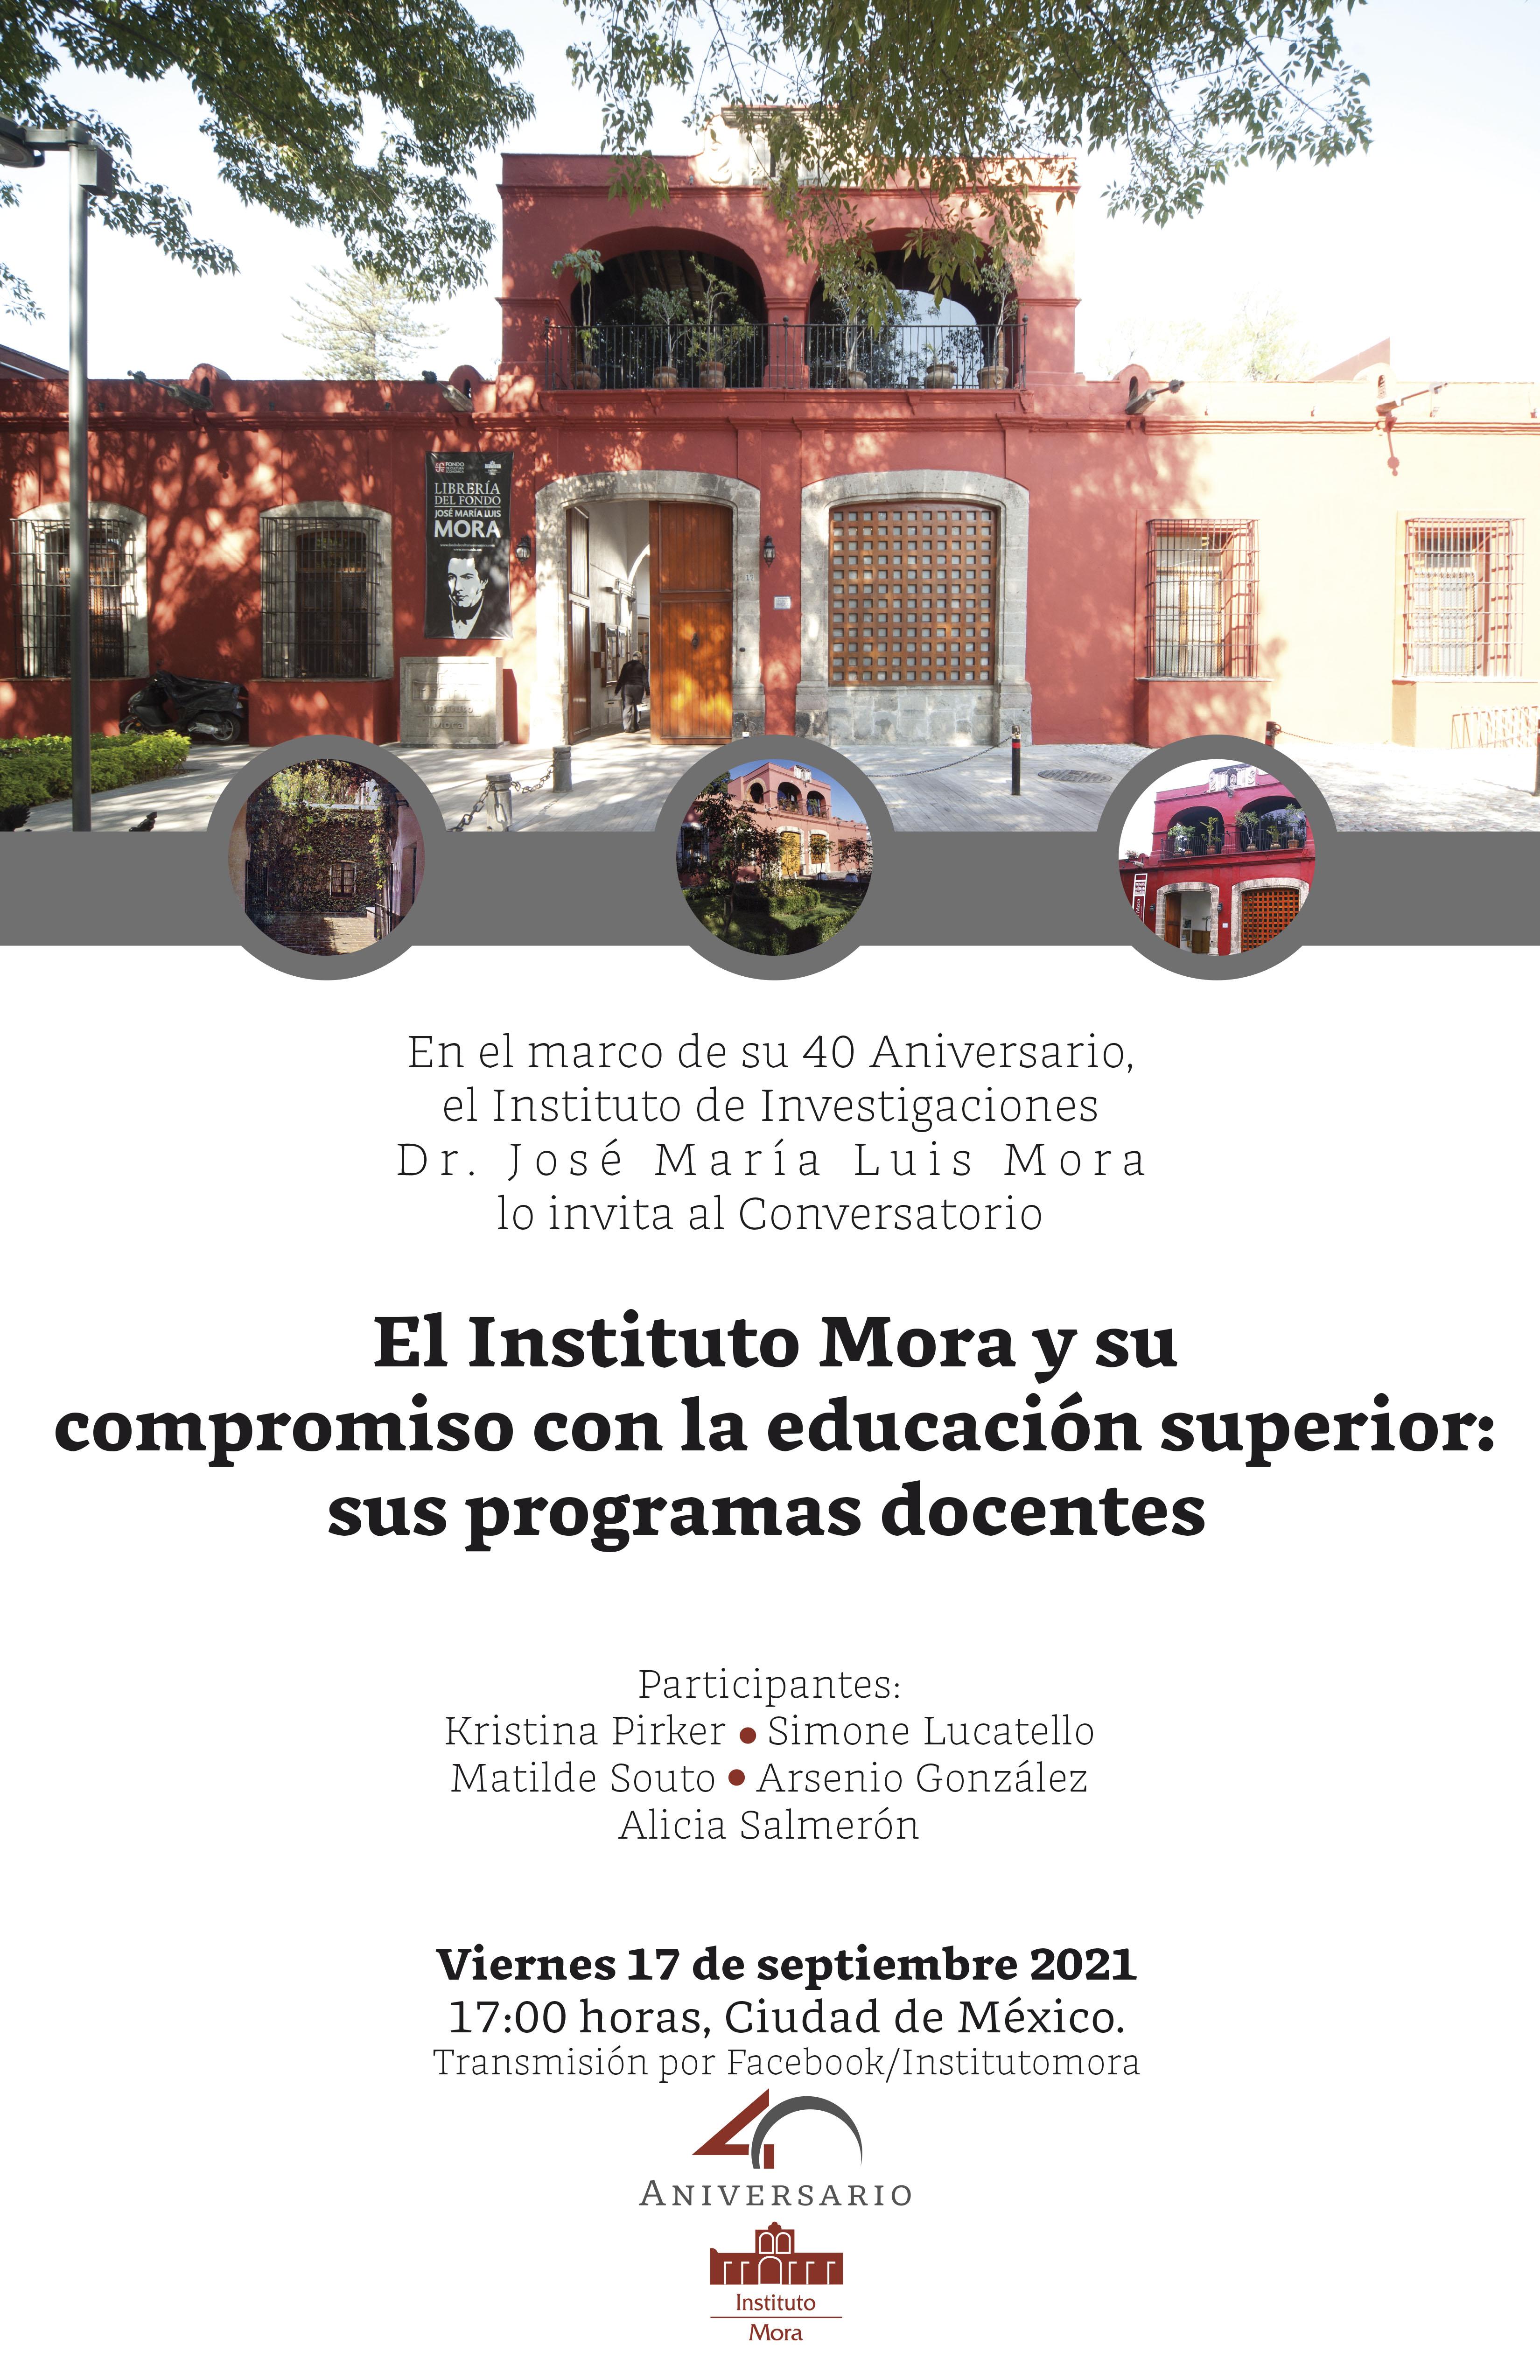 https://www.institutomora.edu.mx/Instituto/IE/1017_IEConver17-0921.jpg